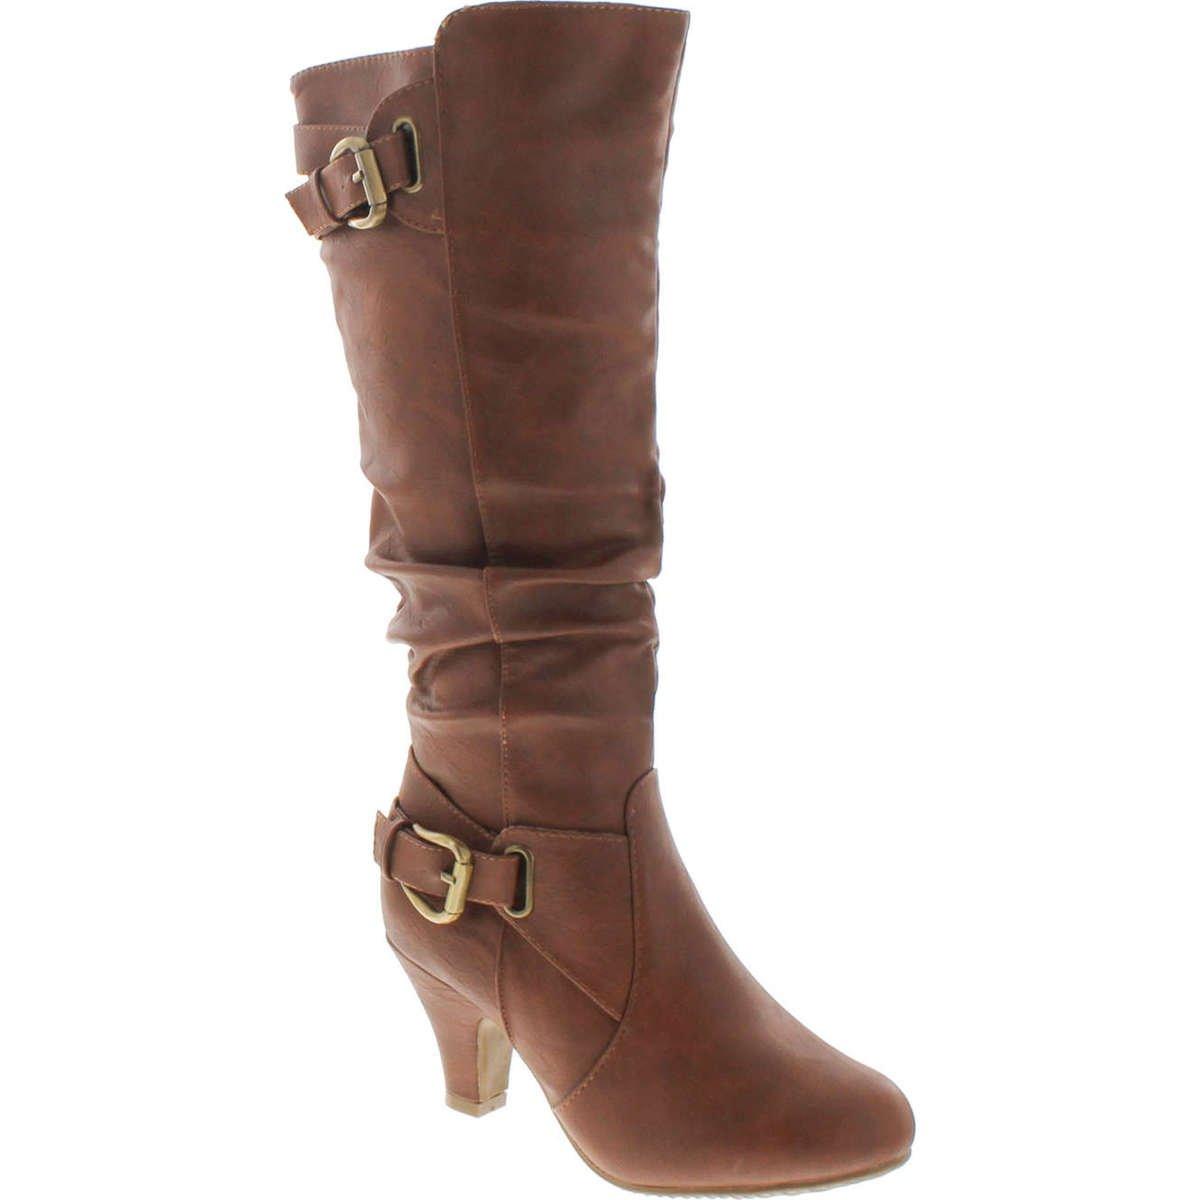 Top Moda Womens Bag-55 Knee High Buckle Slouched Kitten Heel Boots,Tan,6